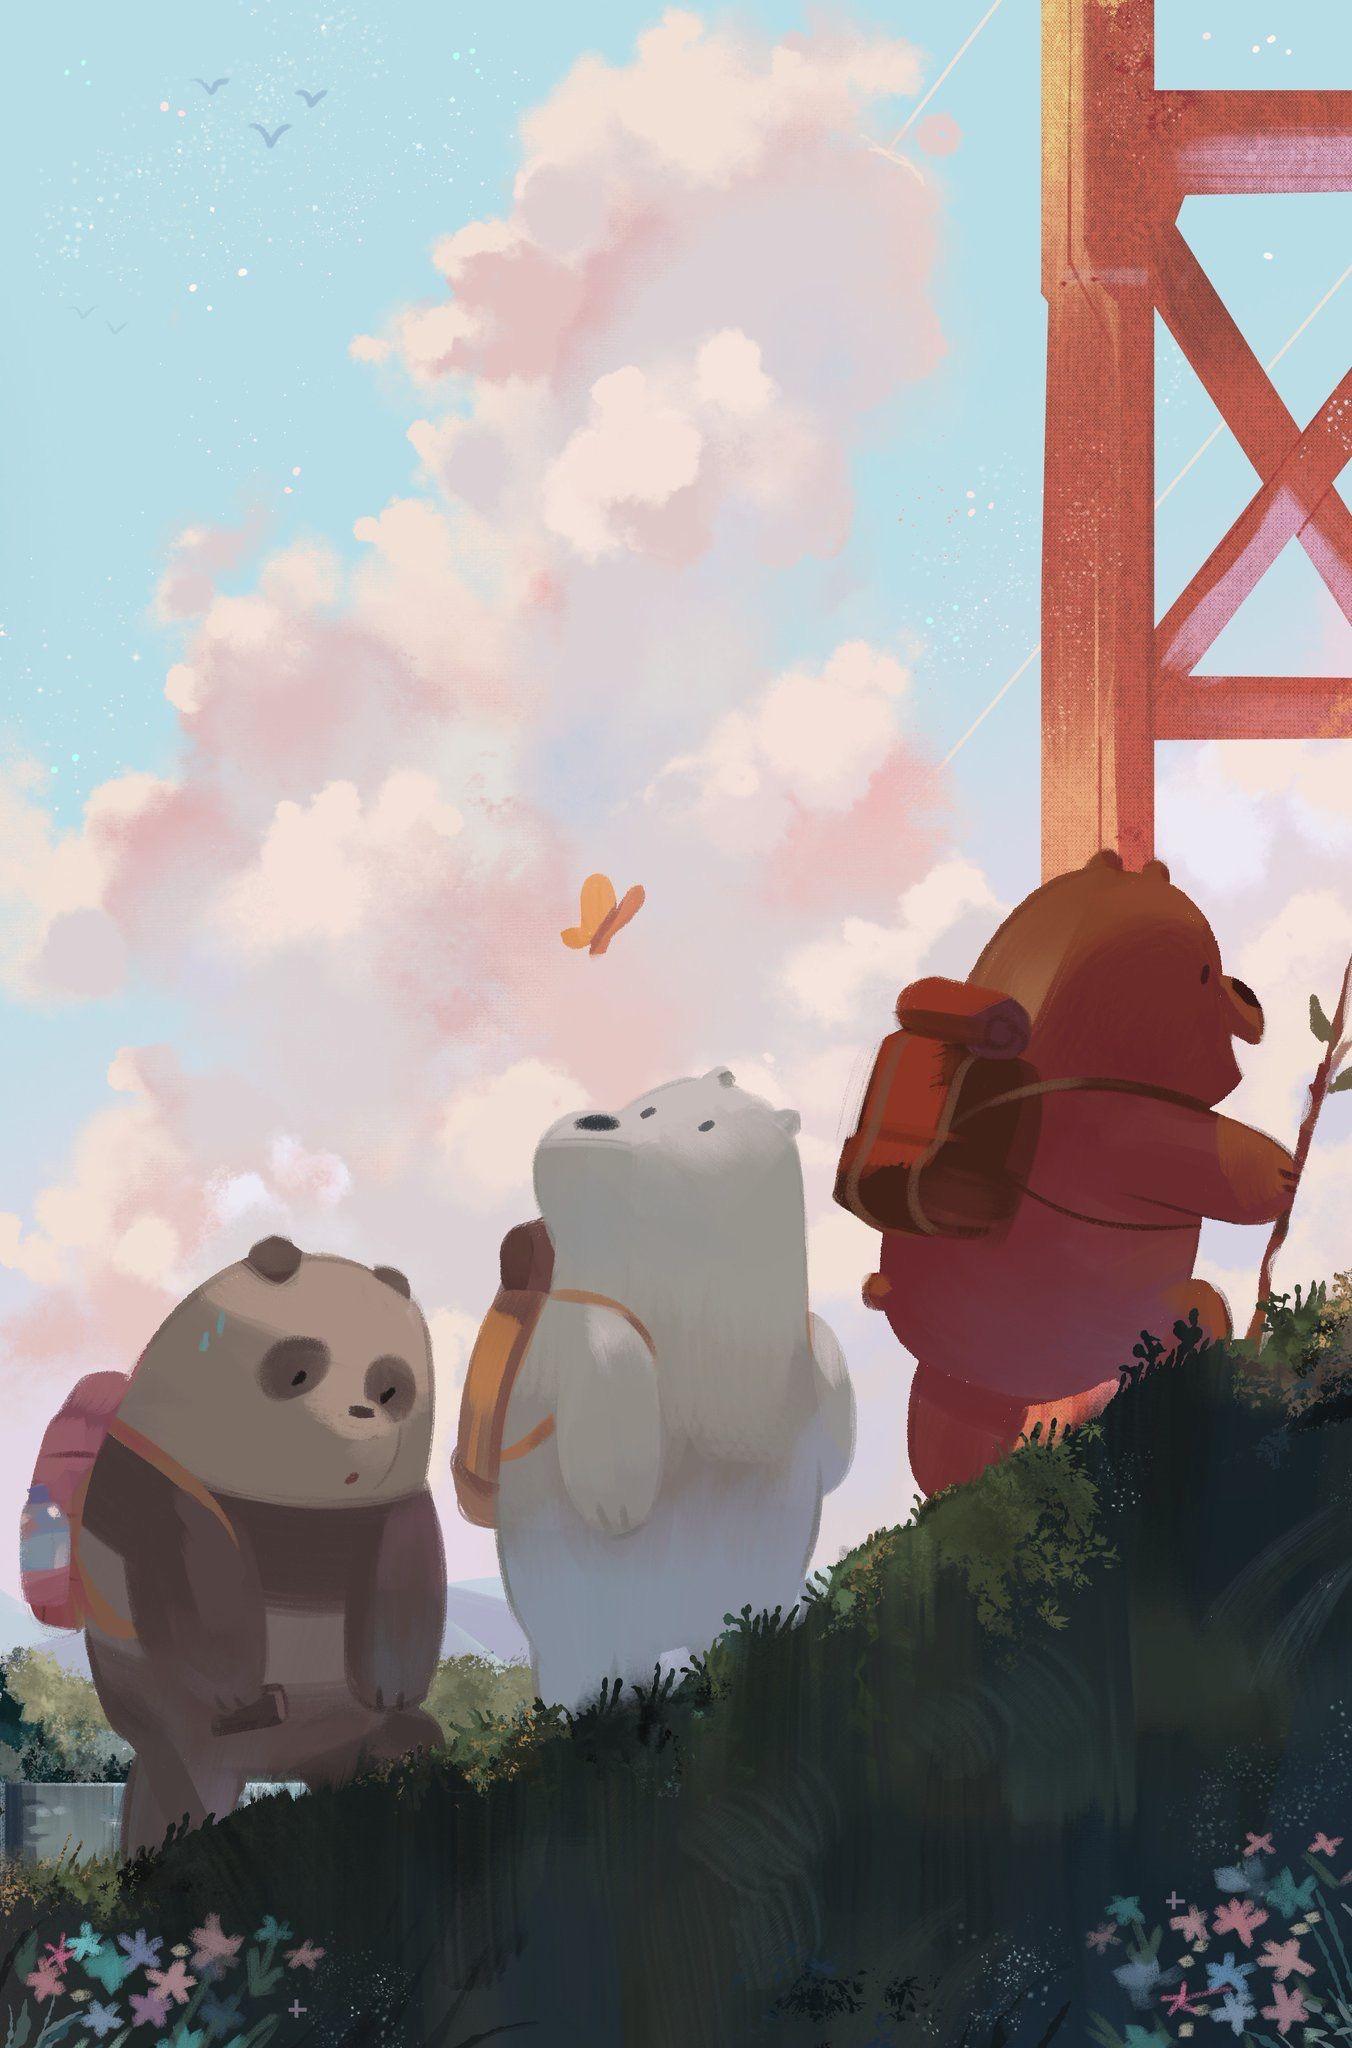 We Bare Bears: Grizz, Panda, Ice bear  Favu002639;s  Pinterest  Bare bears, Bears and Panda